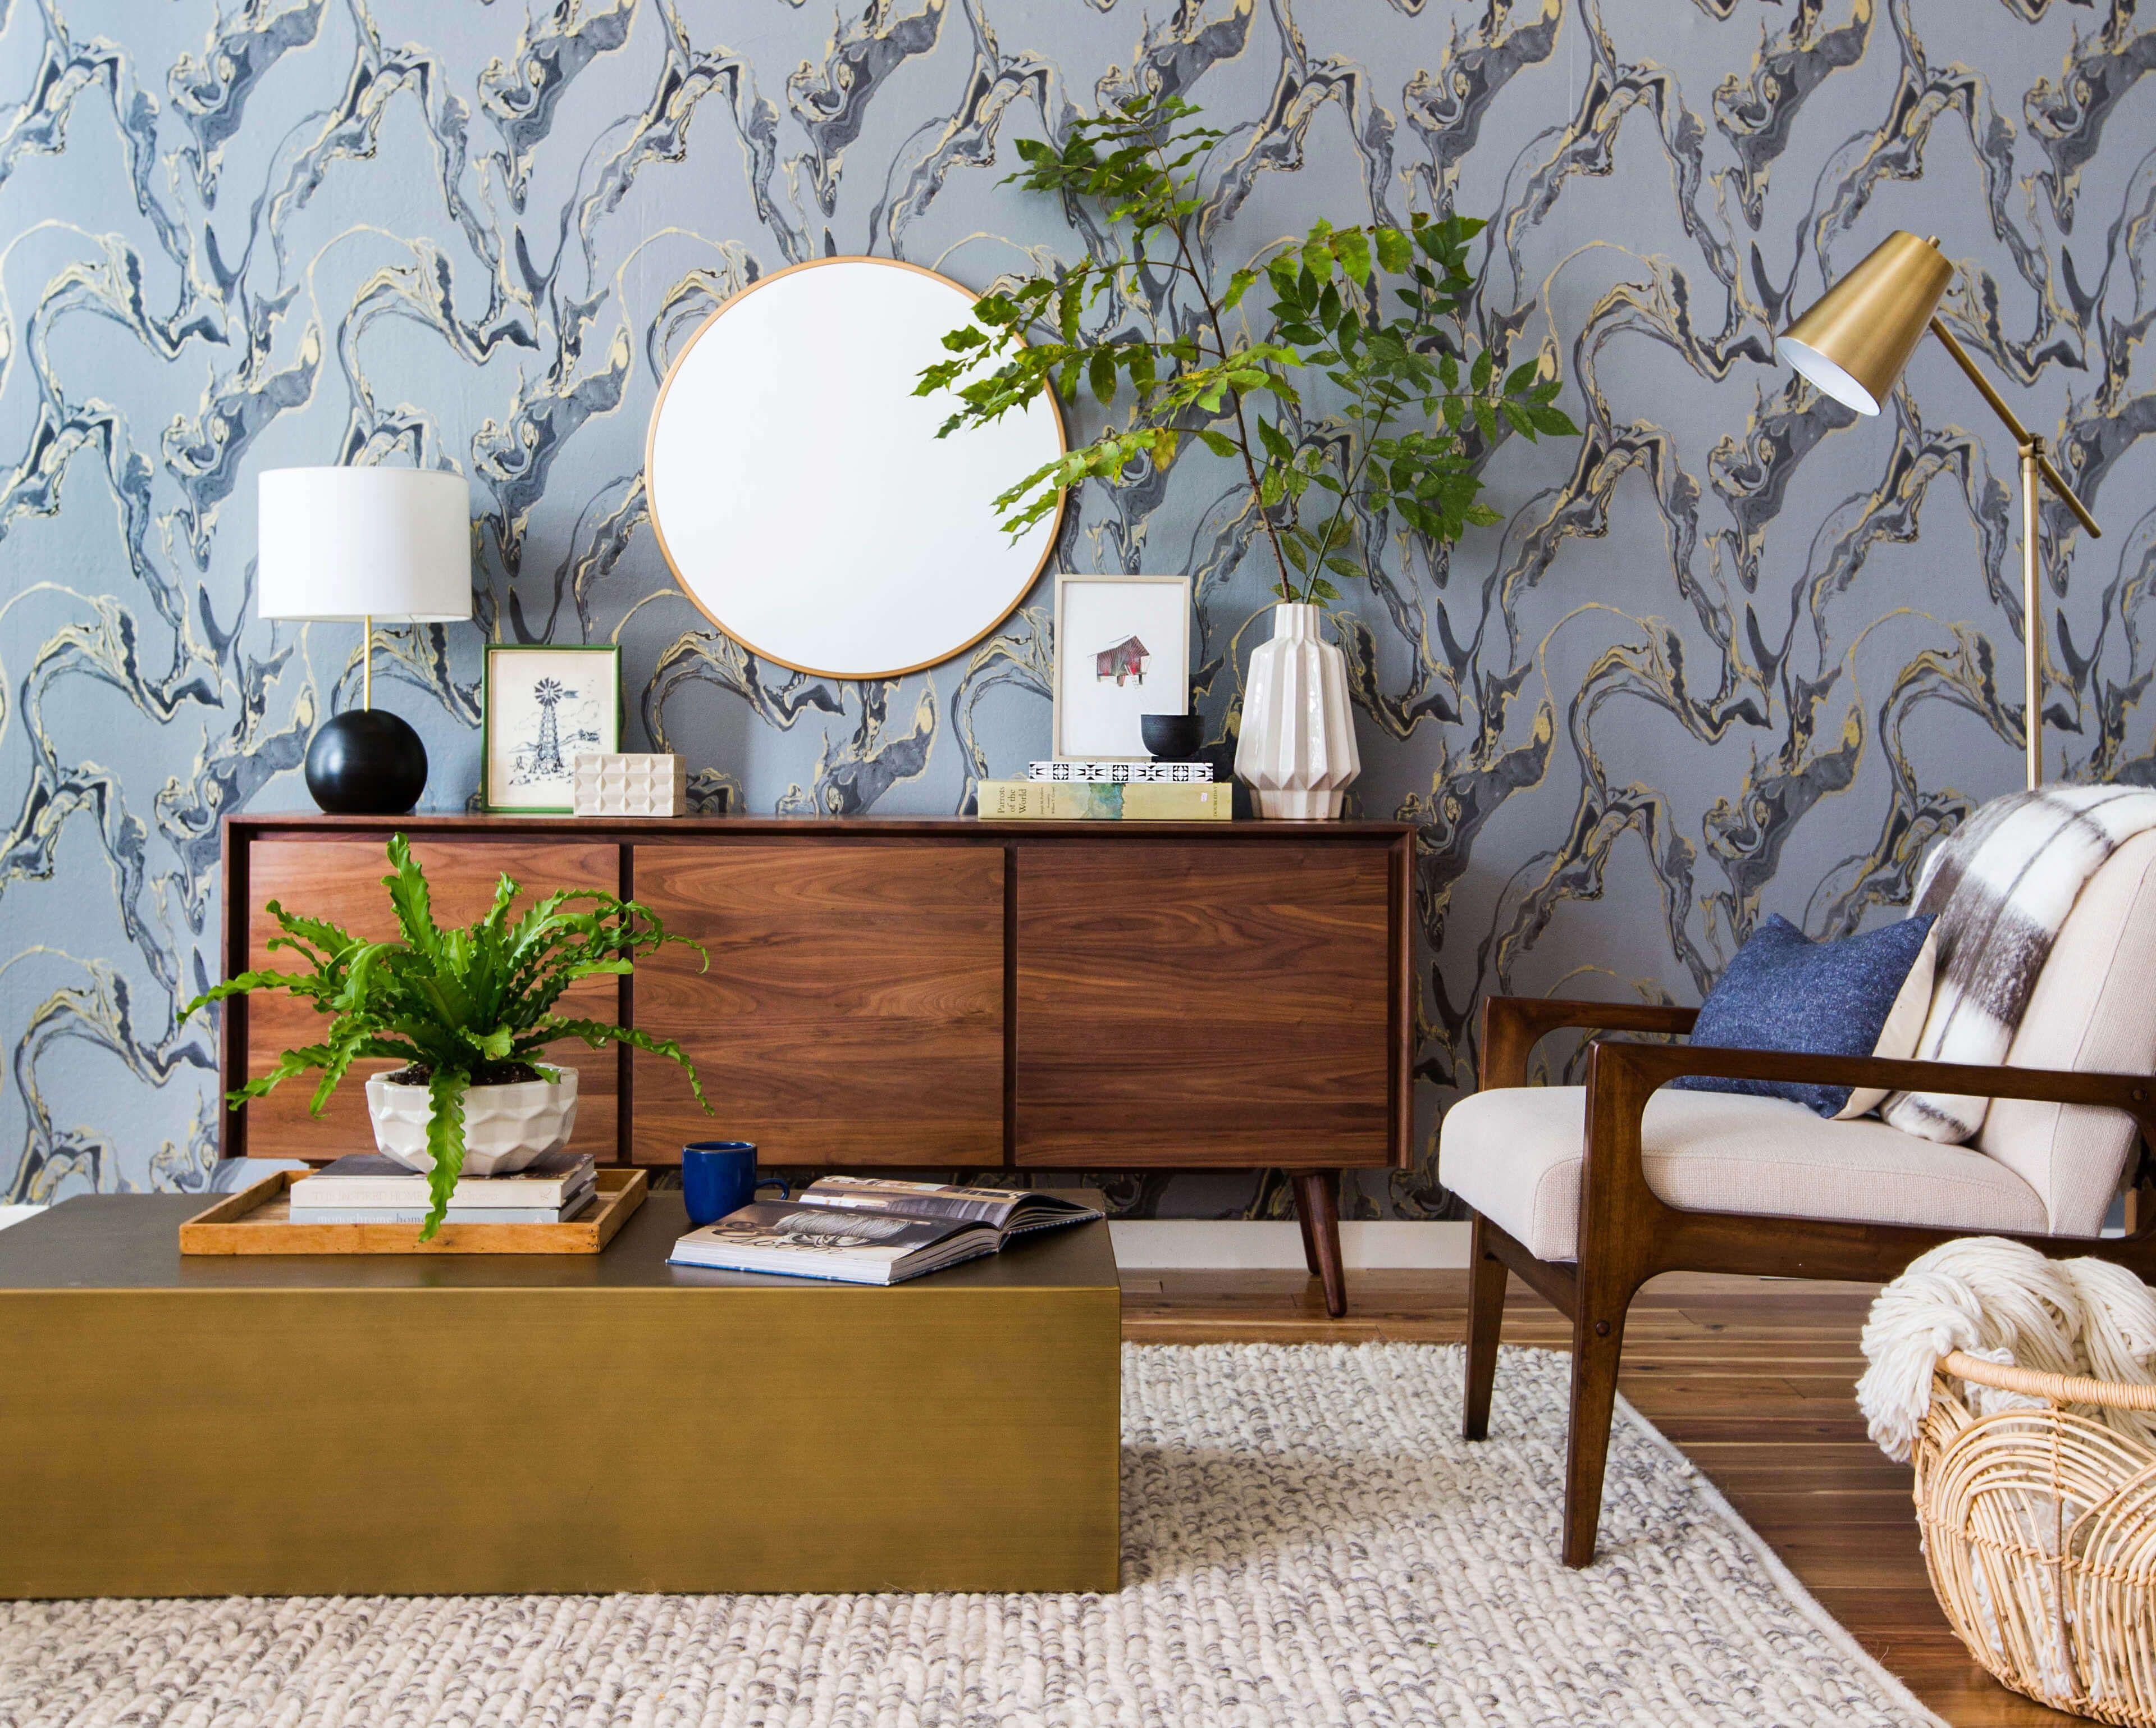 A Neutral Mid Century Living Room Vignette | Home Decor | Pinterest ...